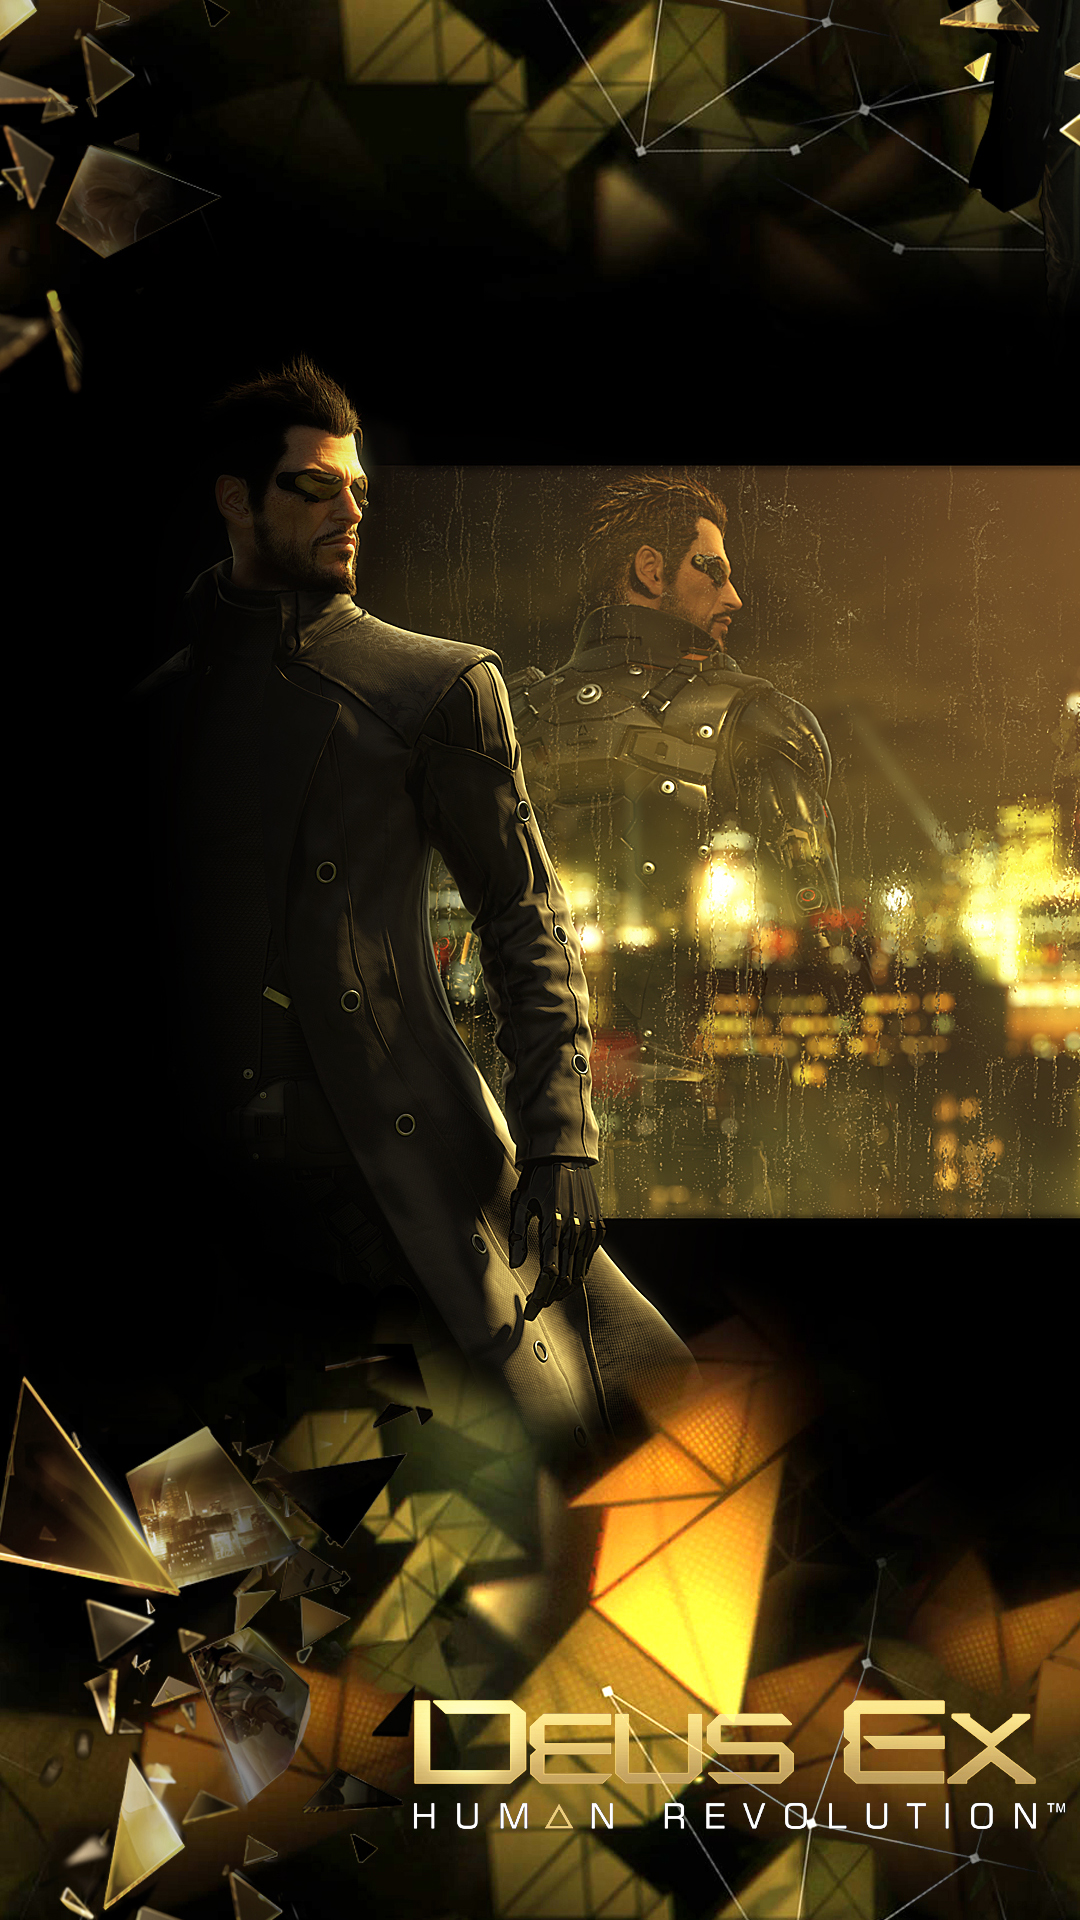 Deus Ex Human Revolution portrait wallpapers 1080x1920